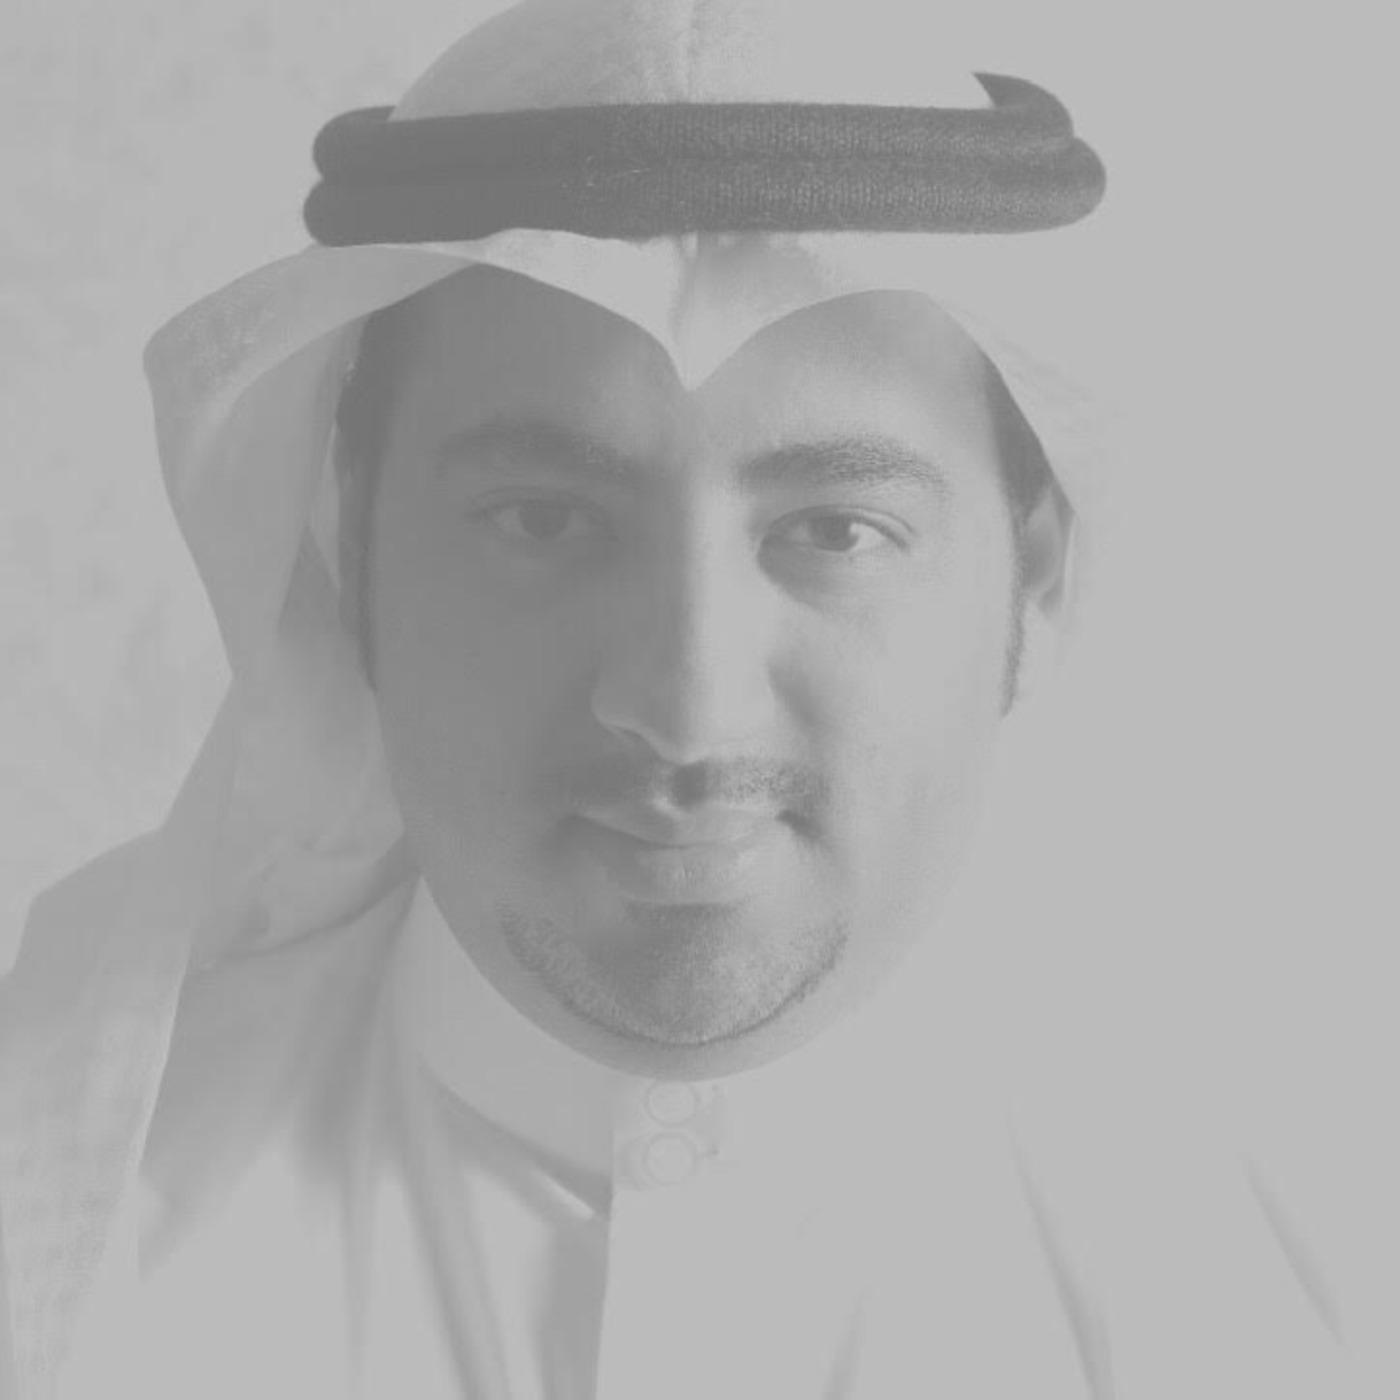 بودكاست محمد آل قيصوم